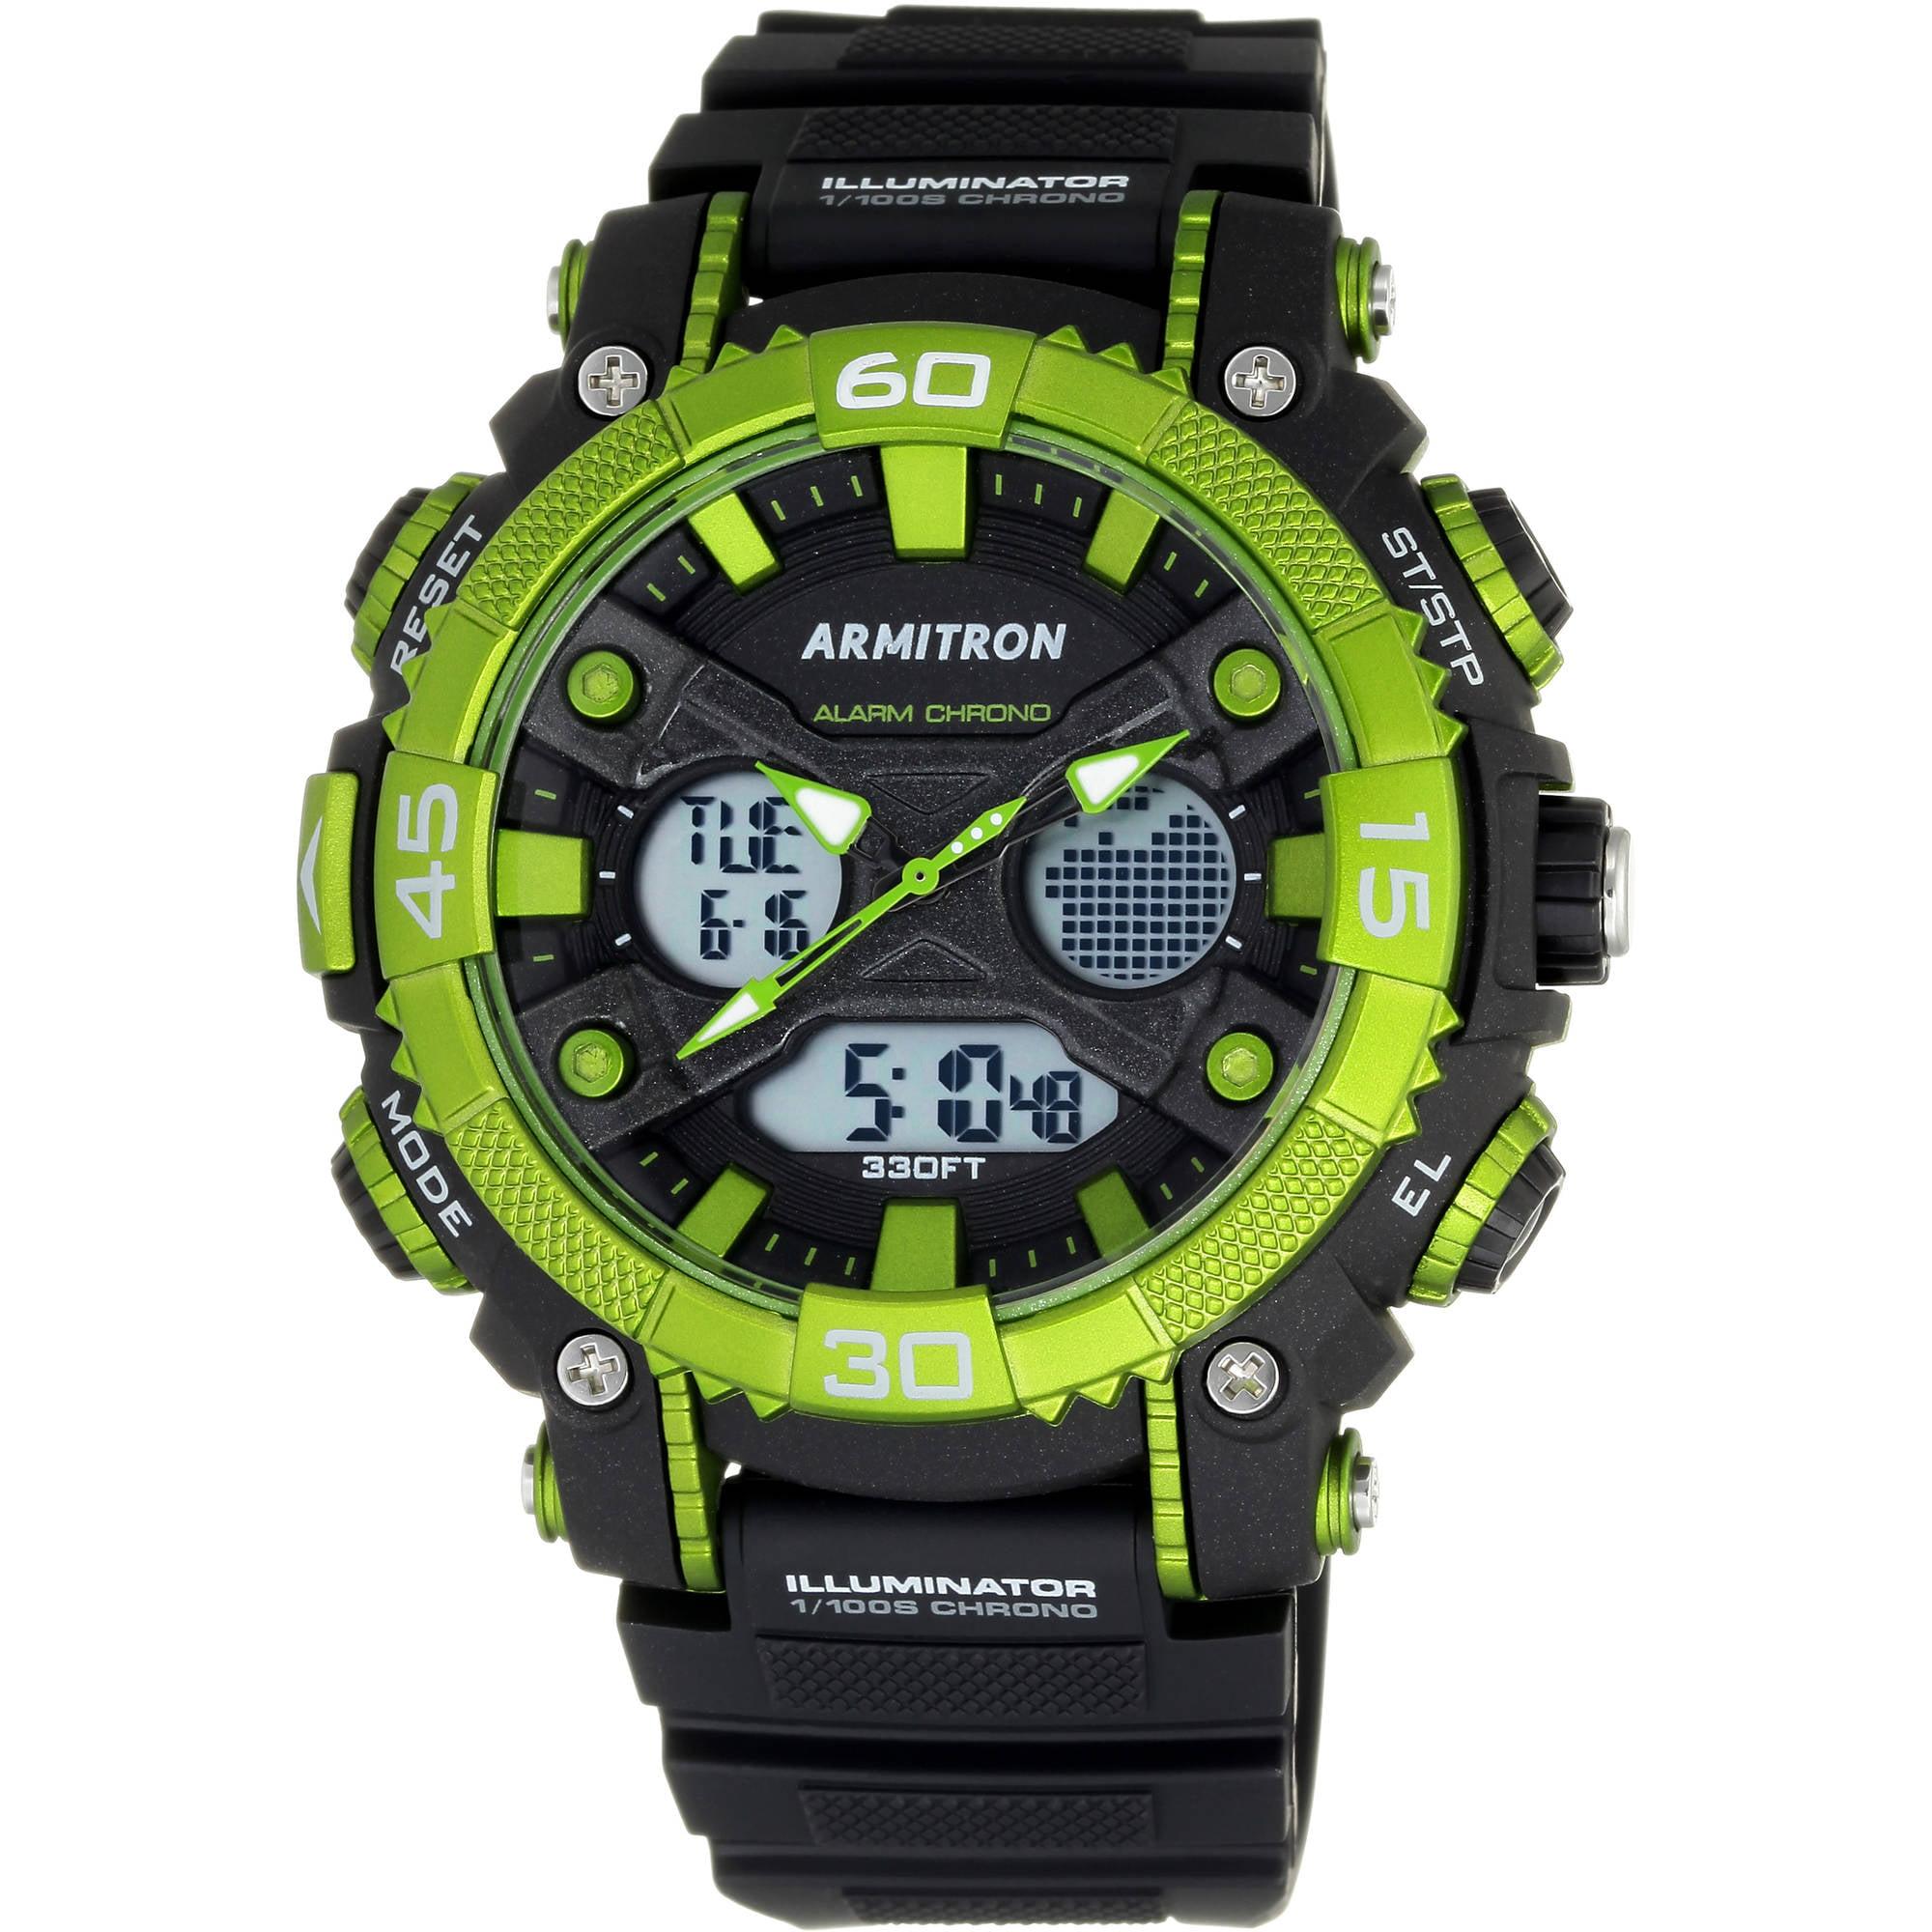 Armitron Men's Showcase Casual Watch, Resin Band